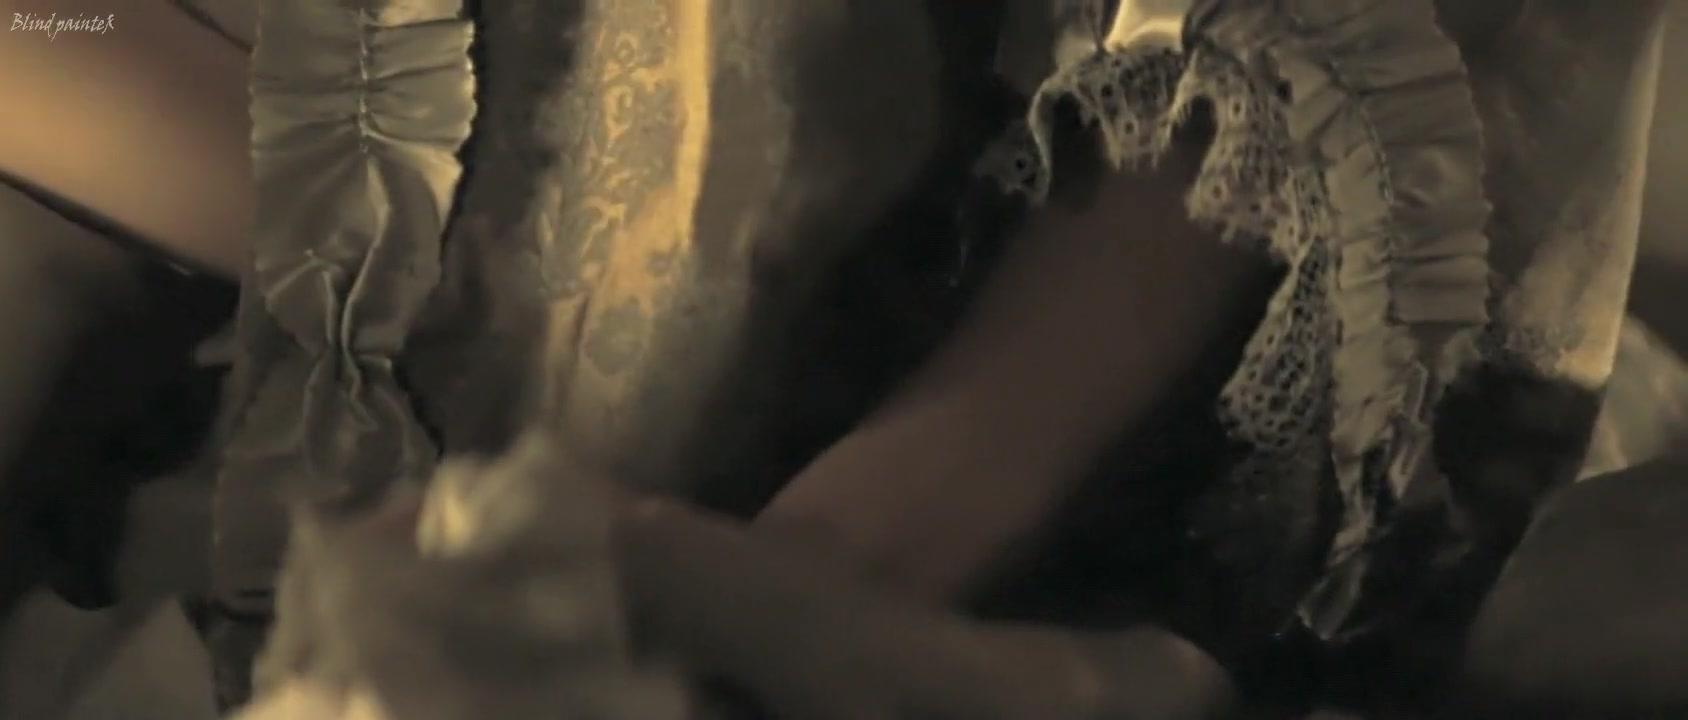 XXX Porn tube Dating london sites